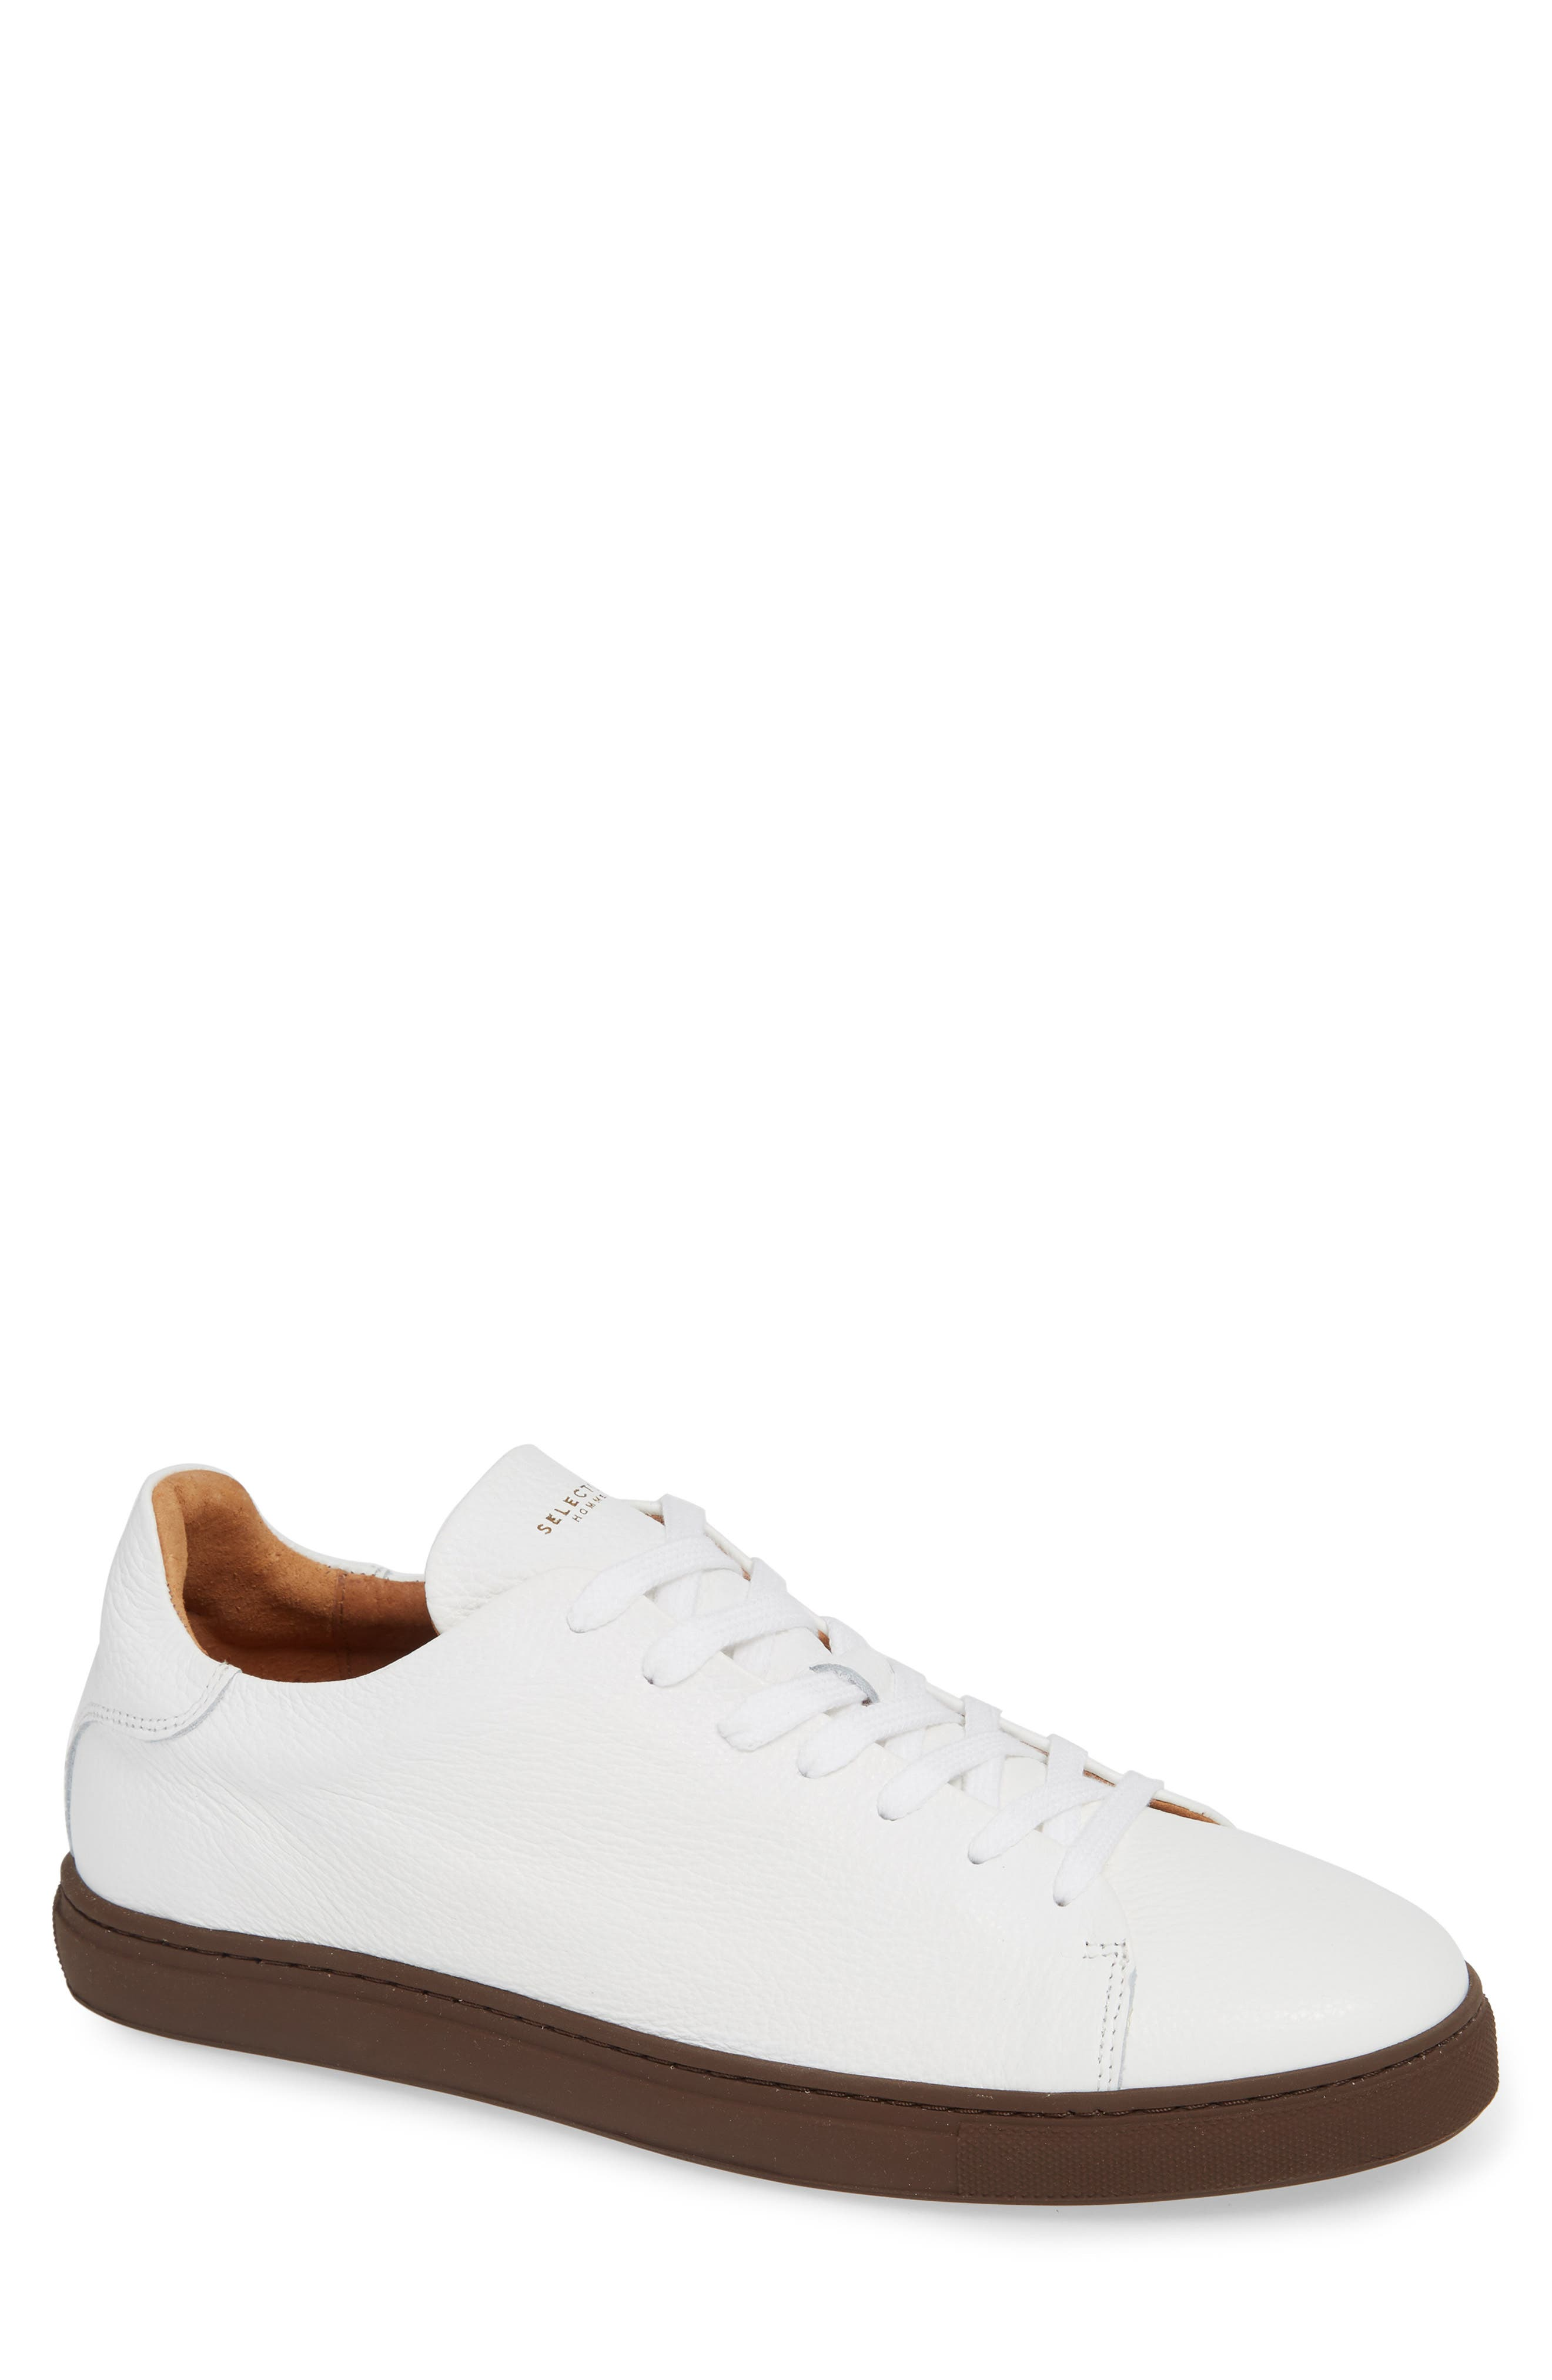 David Sneaker,                             Main thumbnail 1, color,                             WHITE/ BURGUNDY SOLE